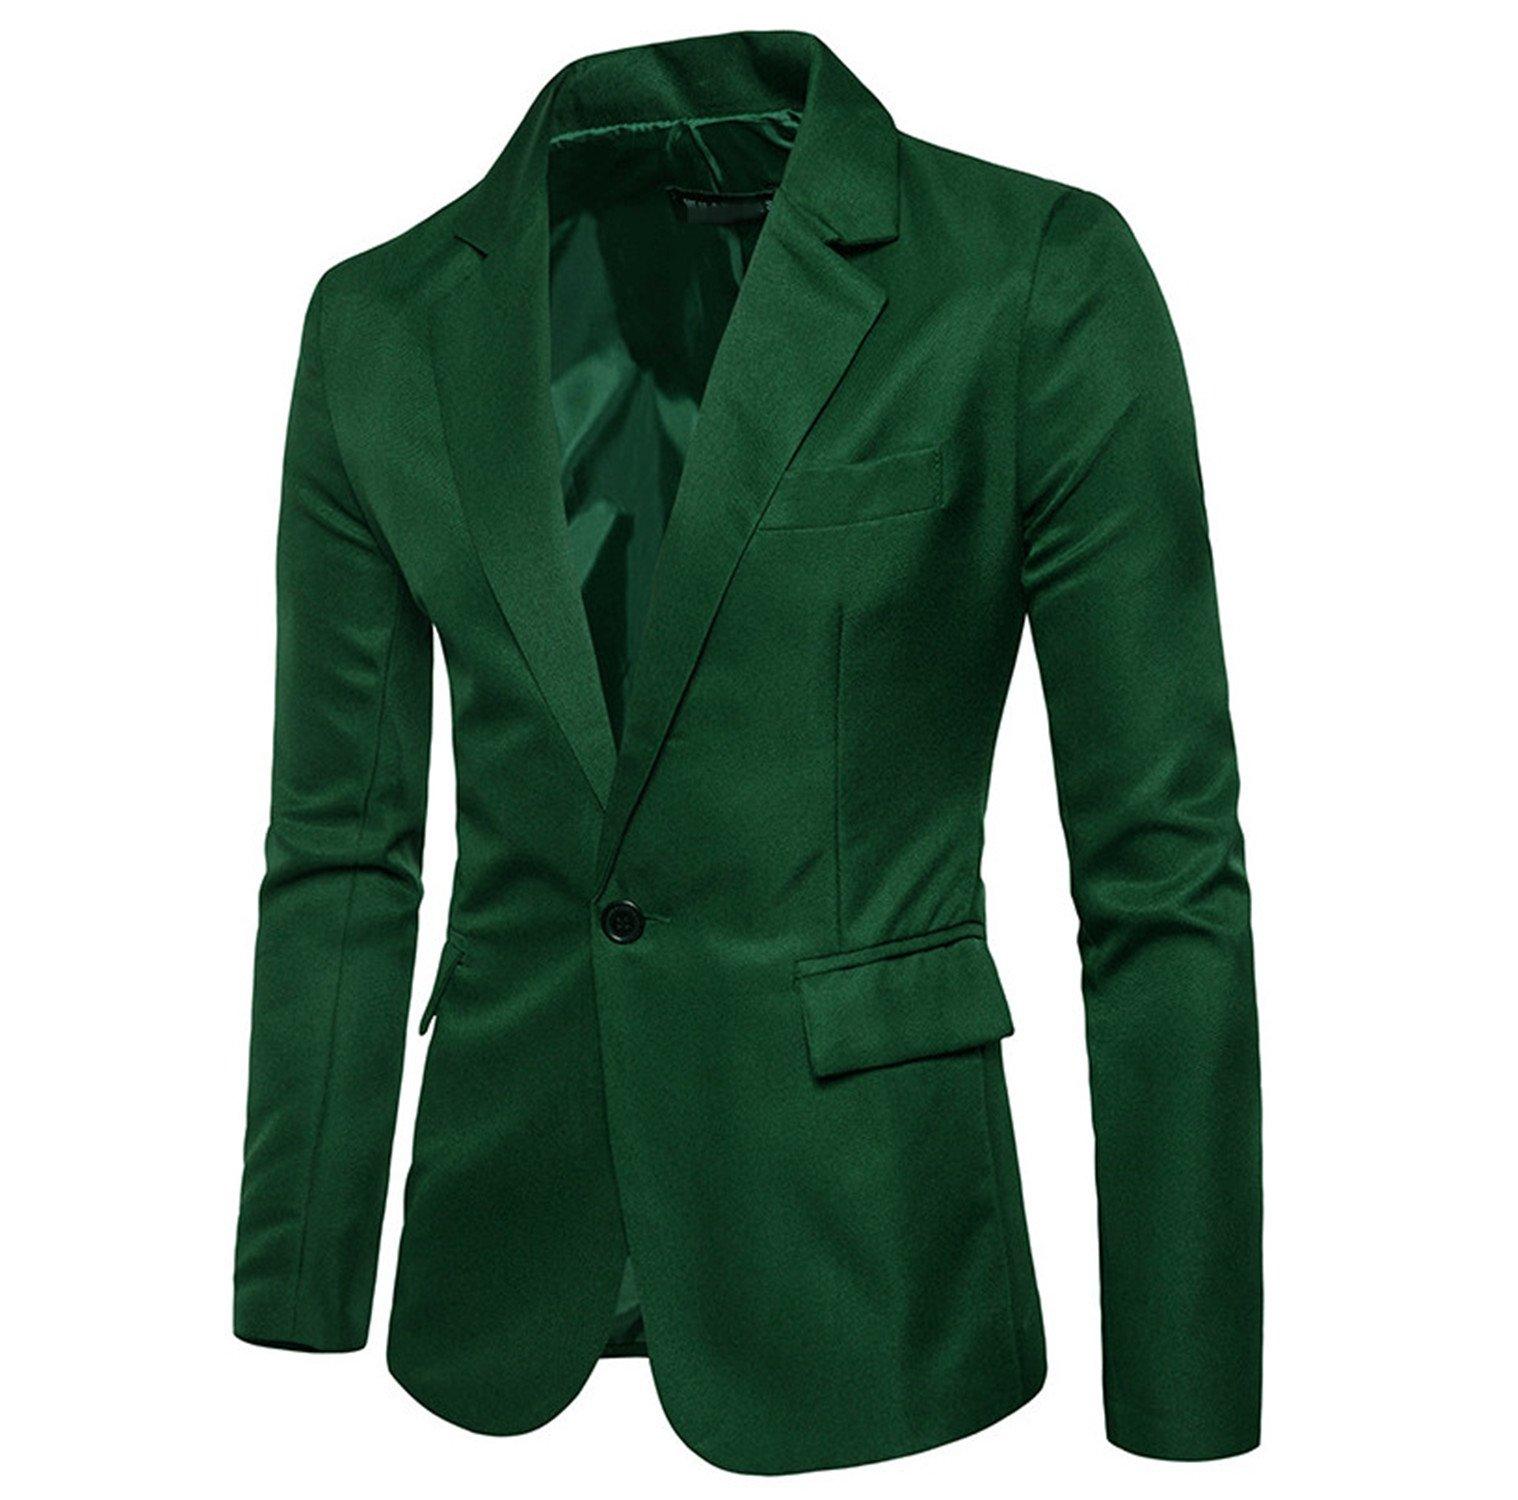 Mandaartins Men Blazer Slim Fit Blazer Autumn Solid Color Business Blazer Wedding Suit Jacket Glass Green L